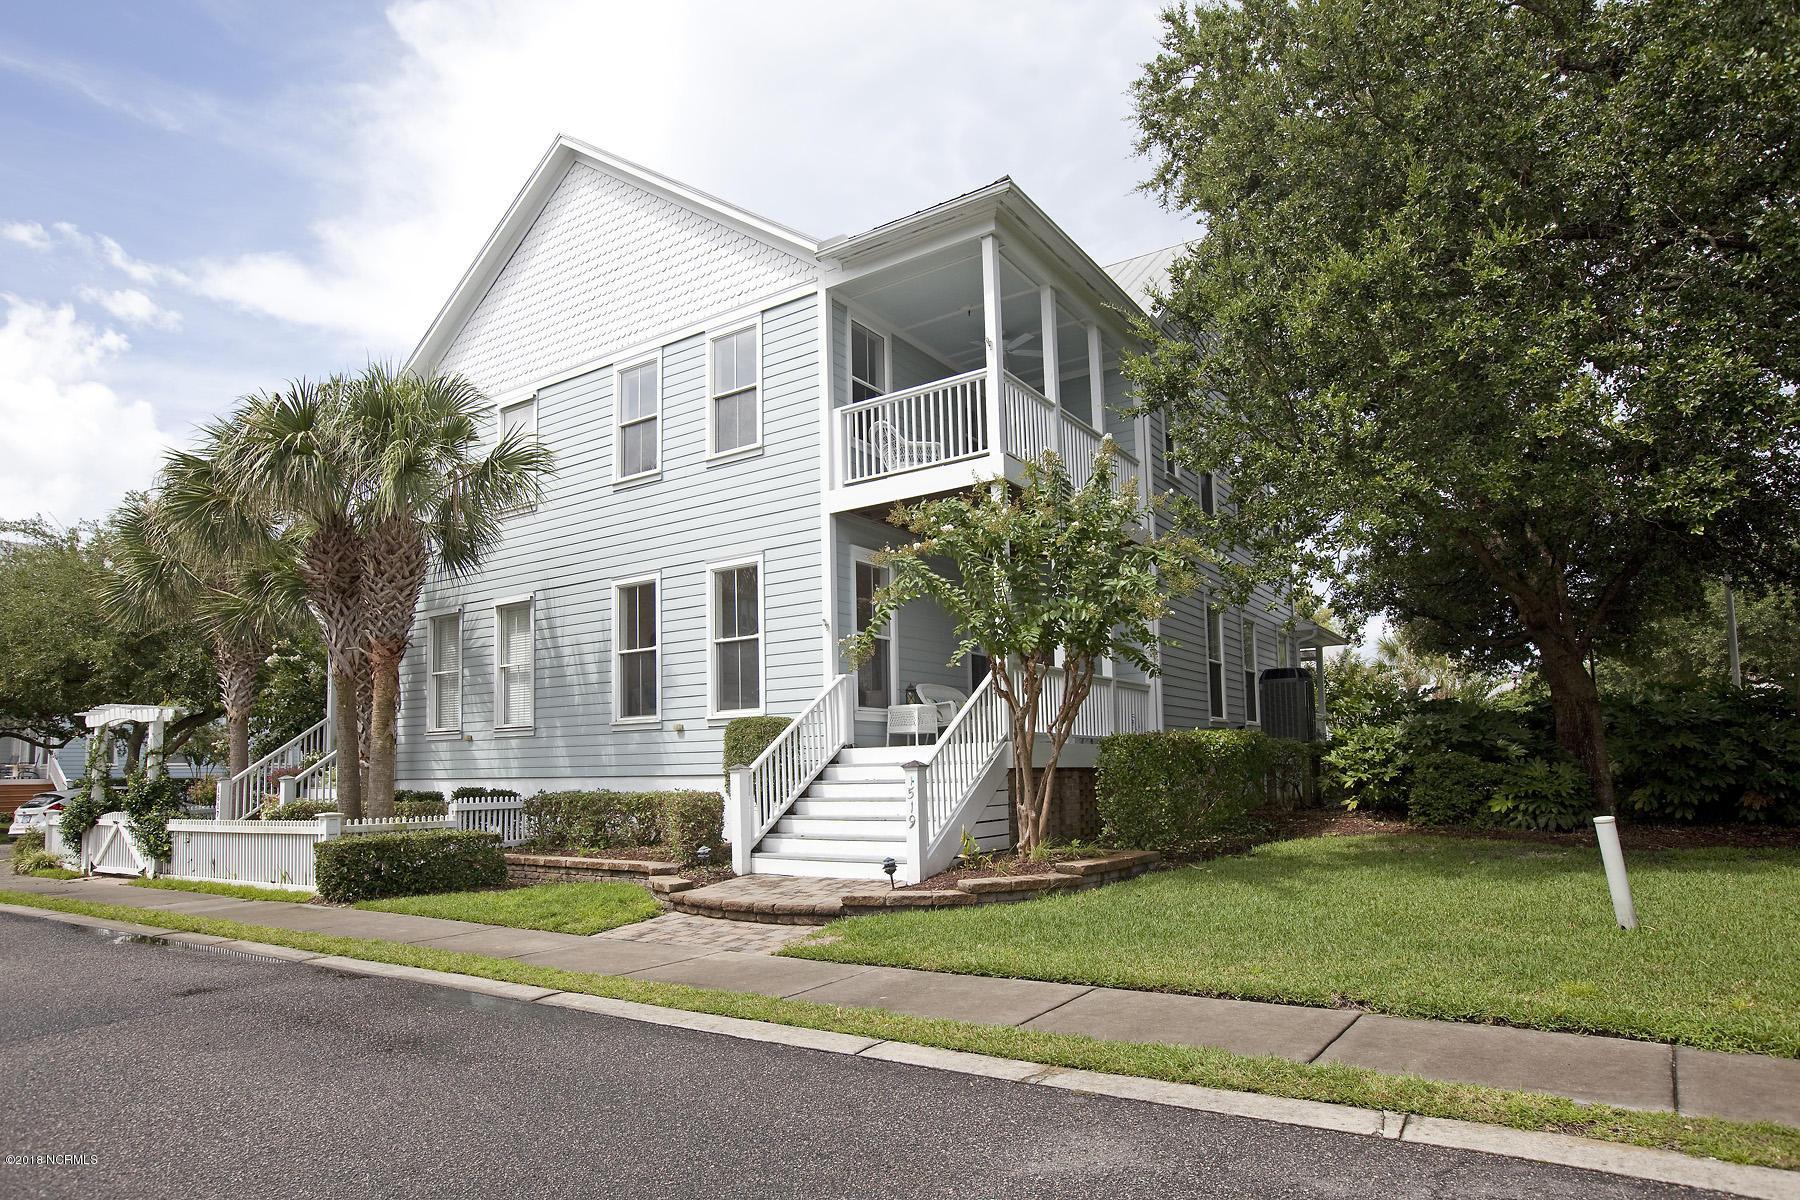 1519 Island Marina Drive- Carolina Beach- North Carolina 28428, 3 Bedrooms Bedrooms, 7 Rooms Rooms,3 BathroomsBathrooms,Residential,For Sale,Island Marina,100129087